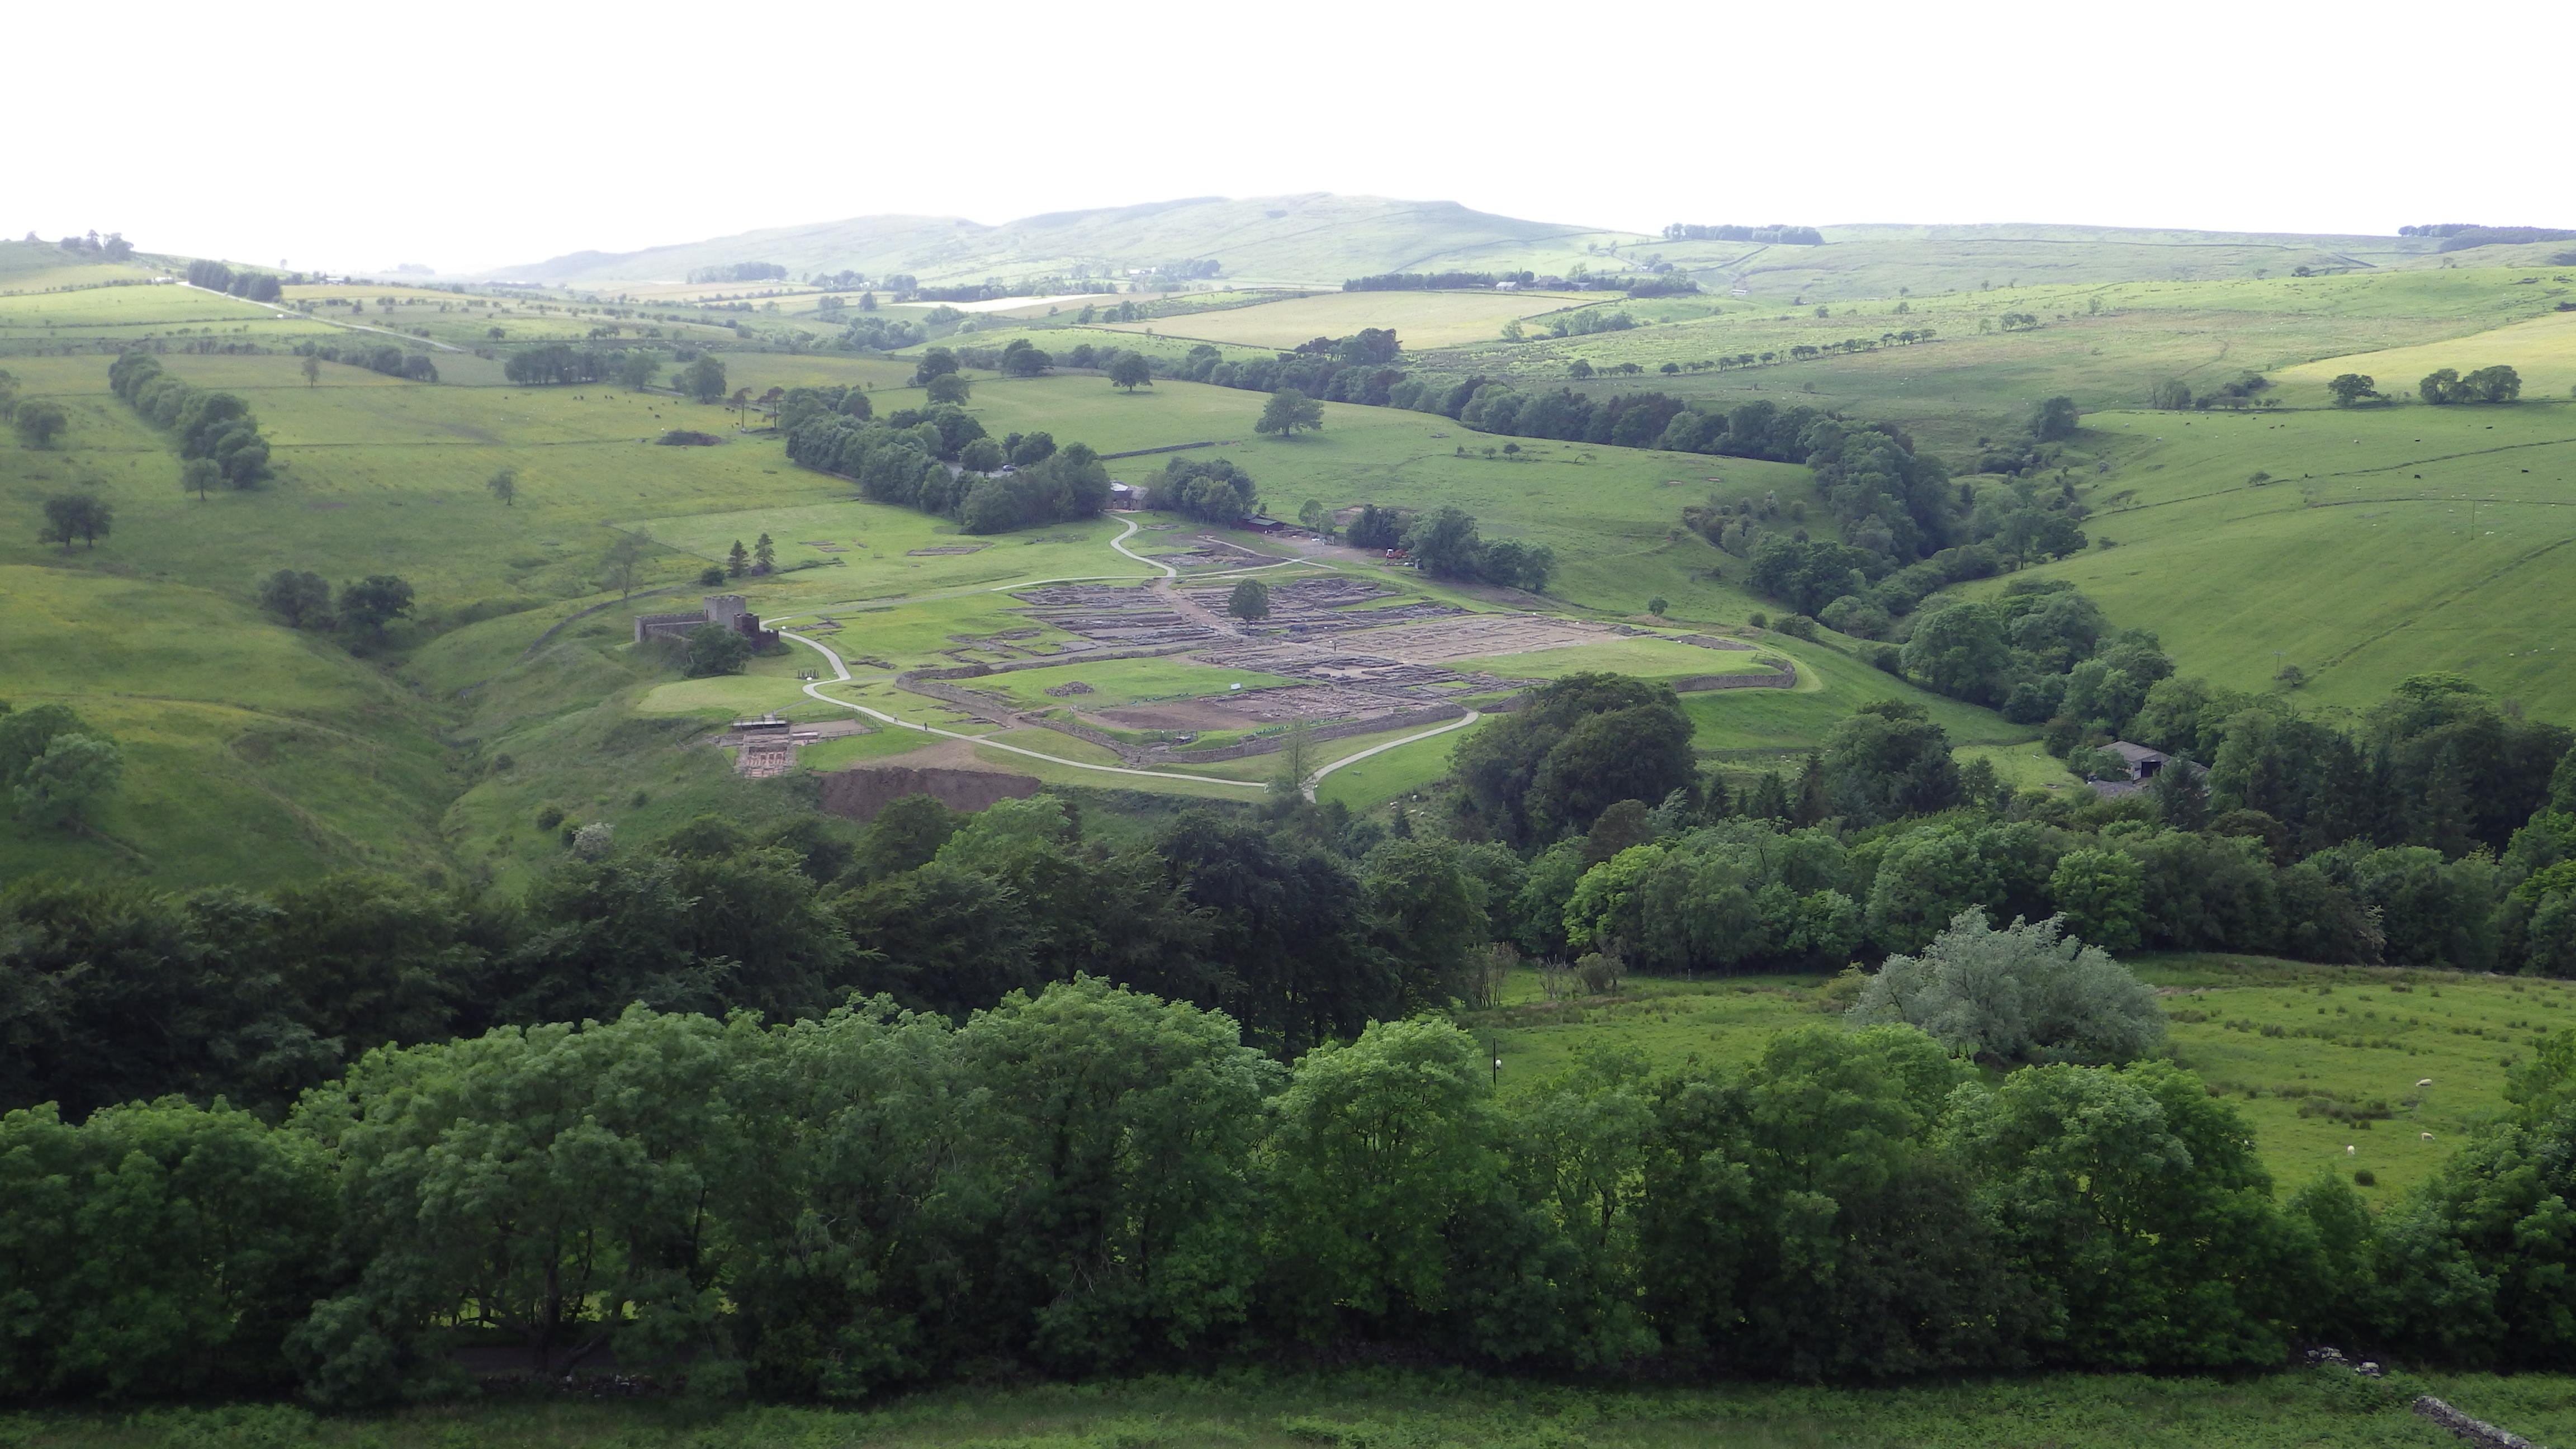 Hike up Barcombe Hill – Western @ Vindolanda